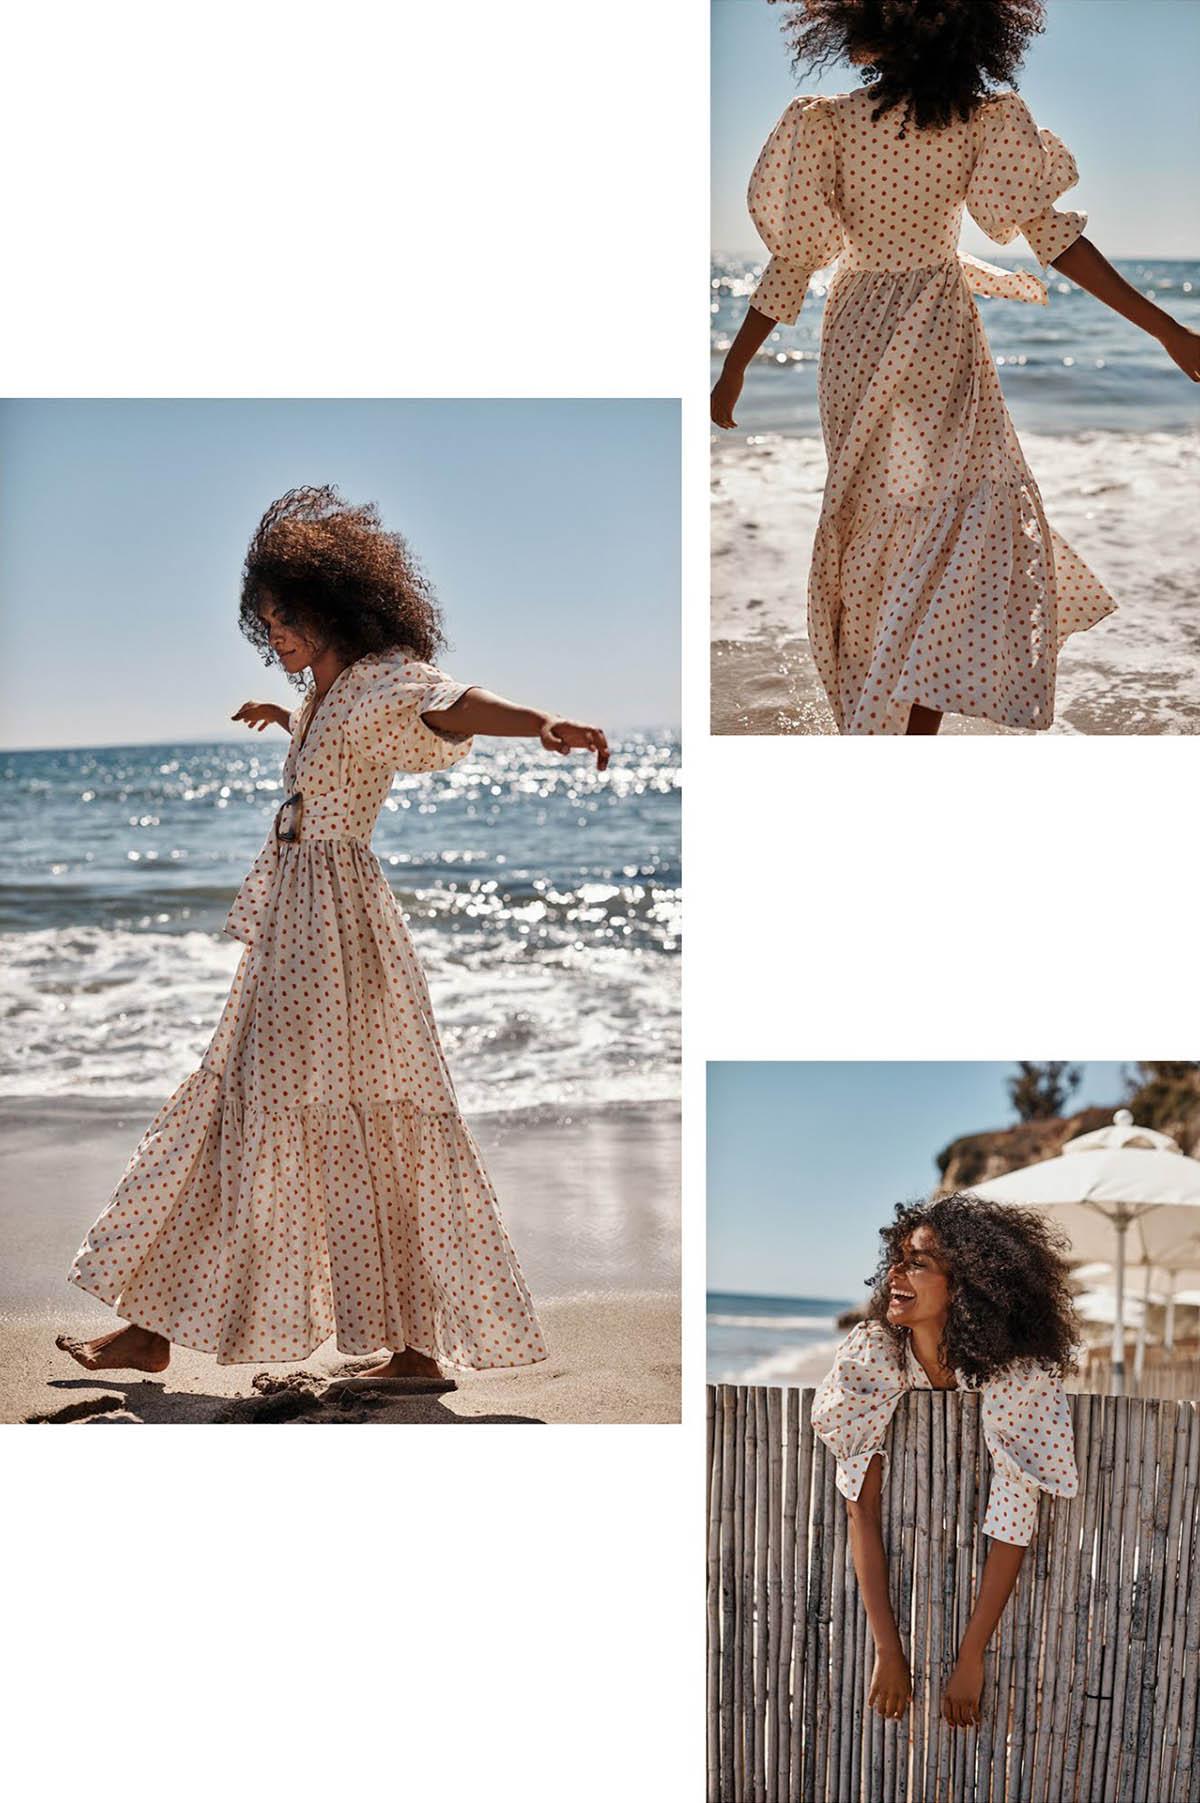 Vanessa Ouma by Colette de Barros for Red Magazine UK June 2021